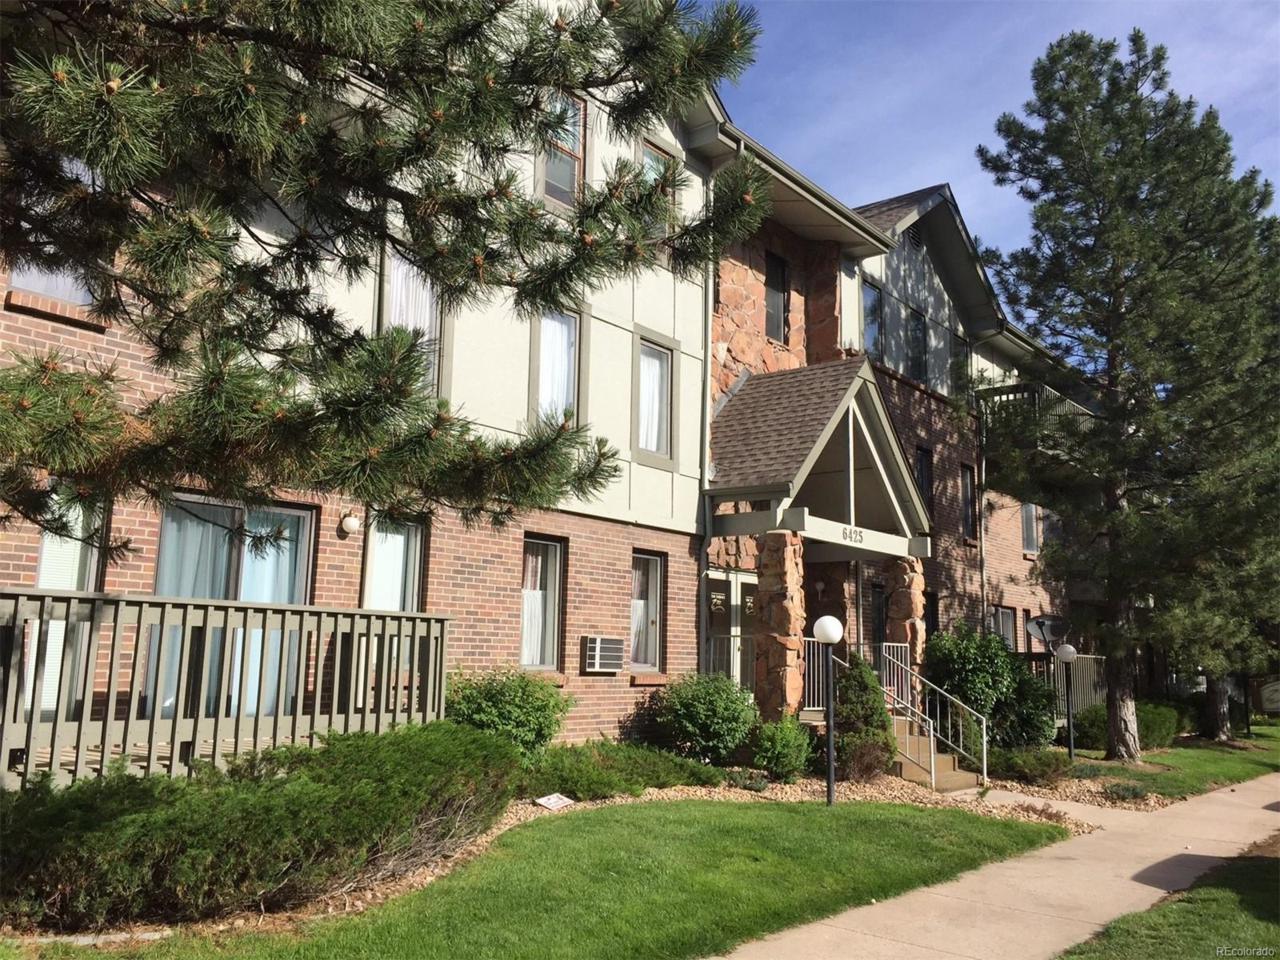 6425 S Dayton Street #104, Centennial, CO 80111 (MLS #3307501) :: 8z Real Estate